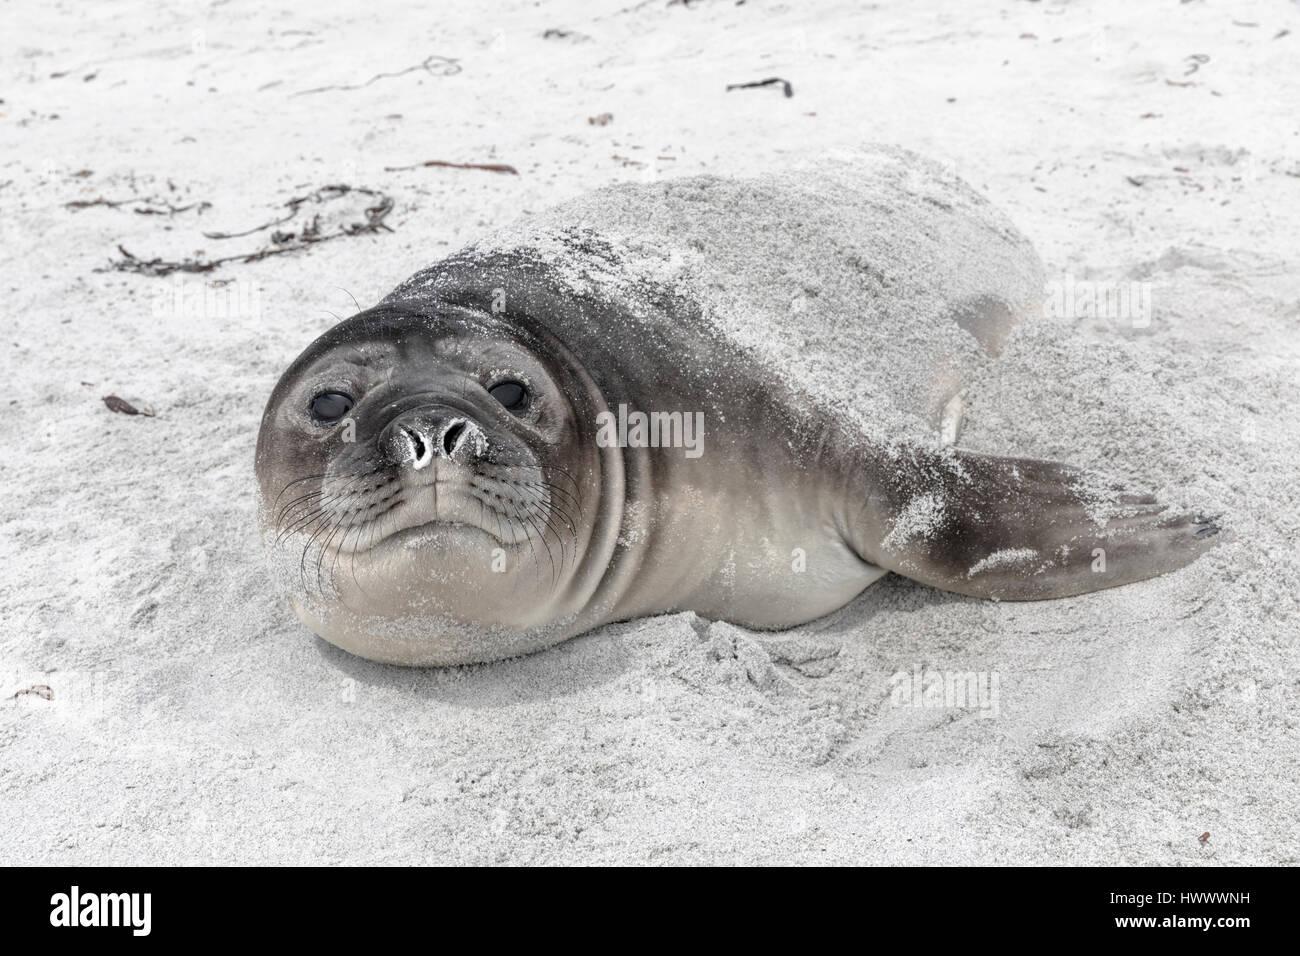 Southern Elephant Seal - Stock Image